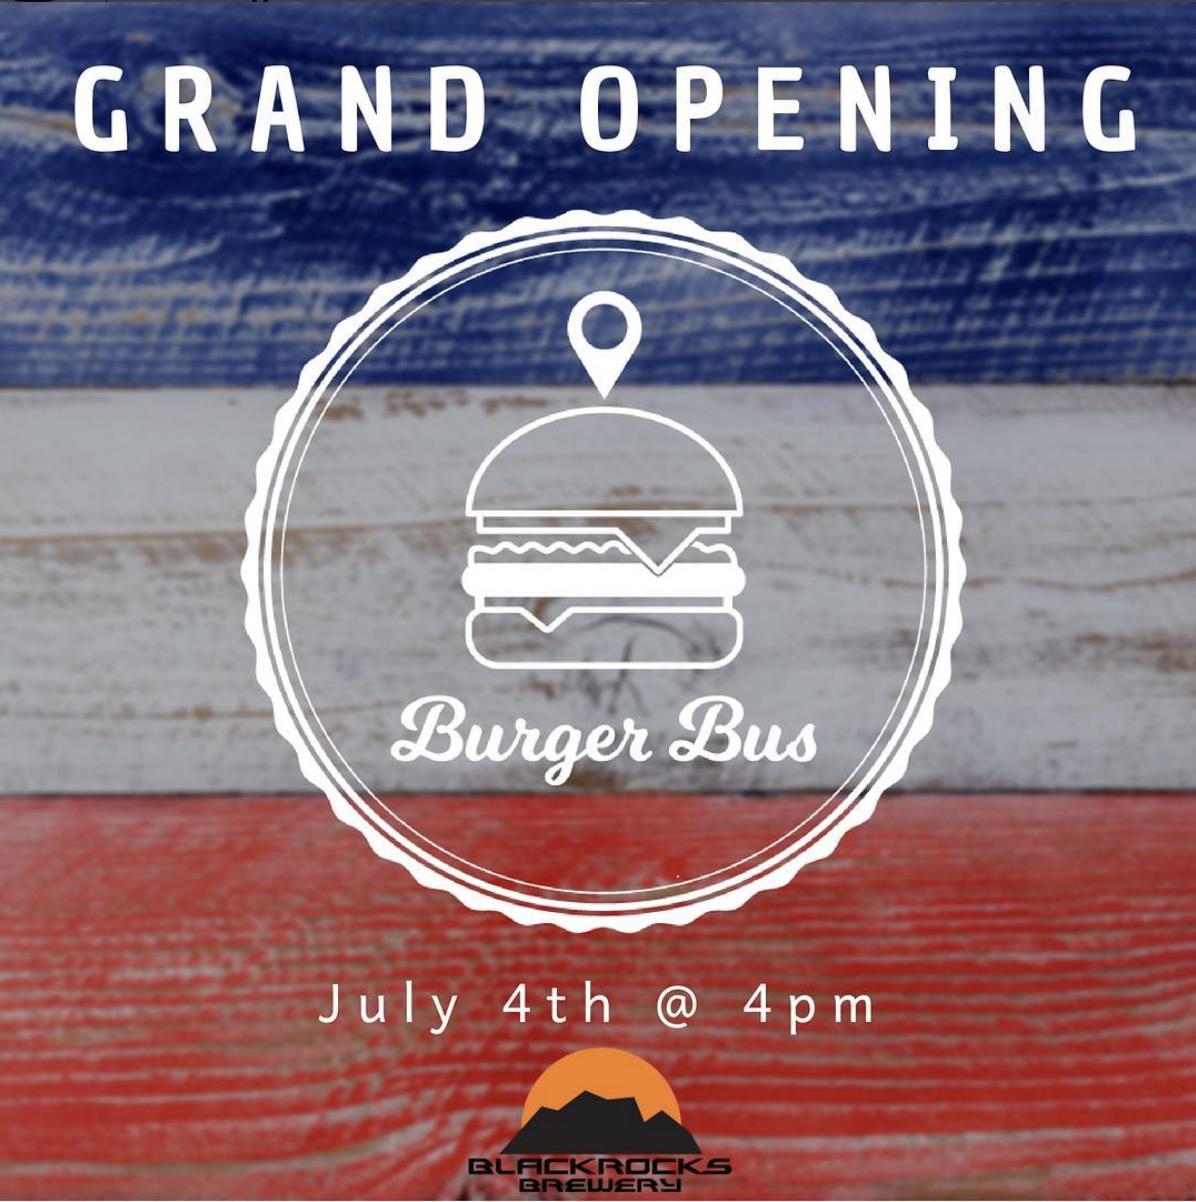 burgerbus-grandopening-blackrocksbrewing.png